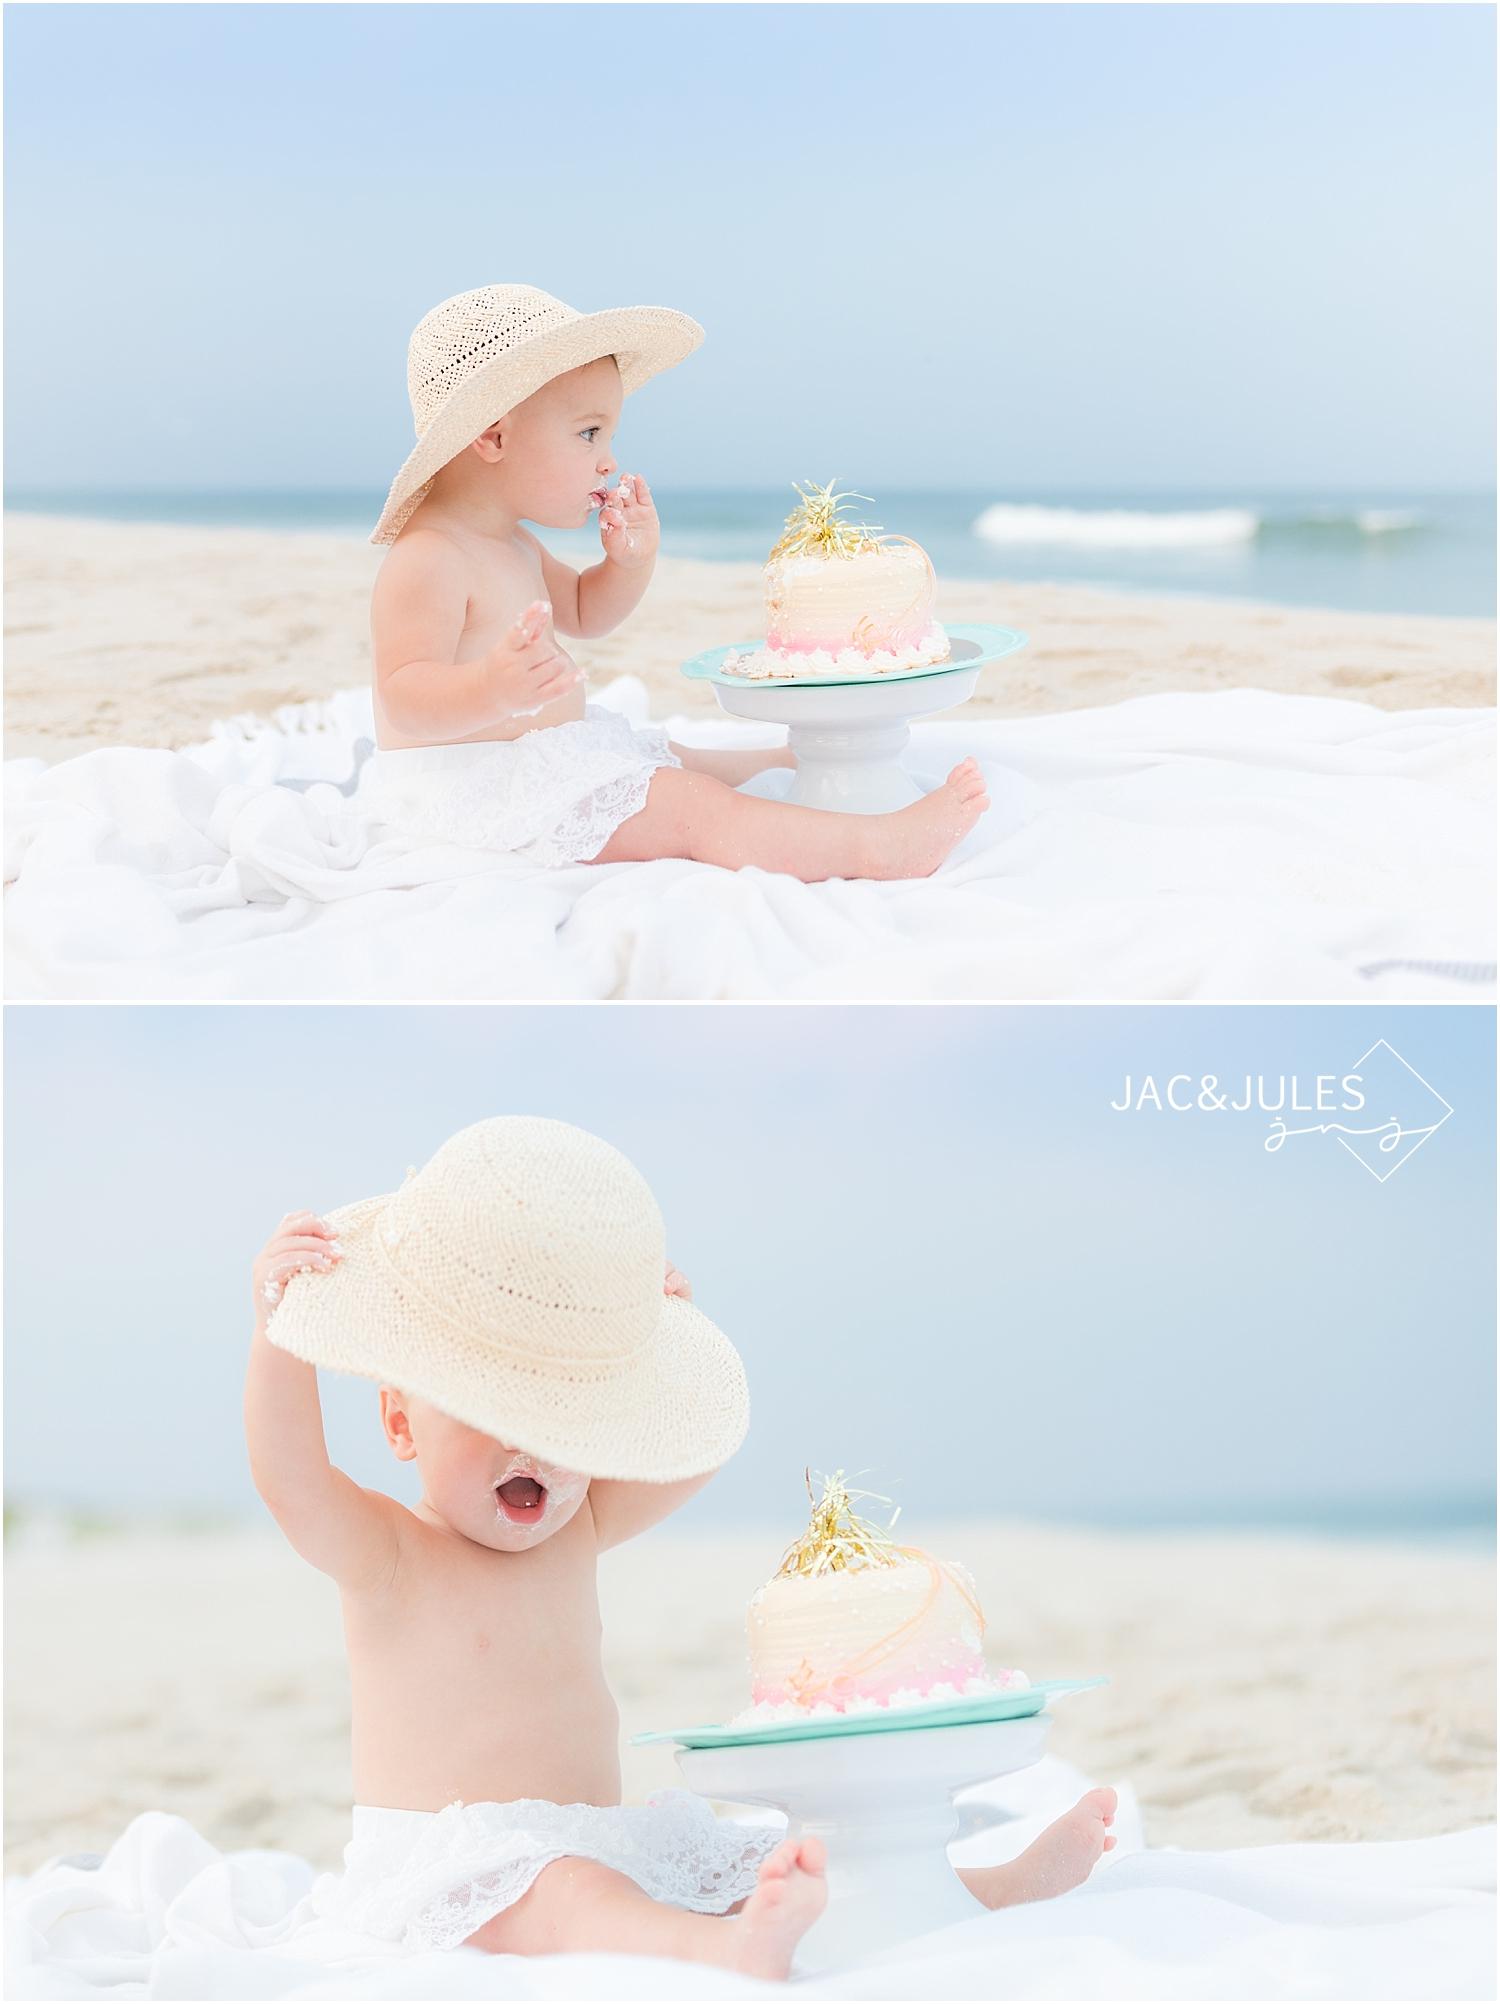 cake smash birthday photos on the beach in new jersey